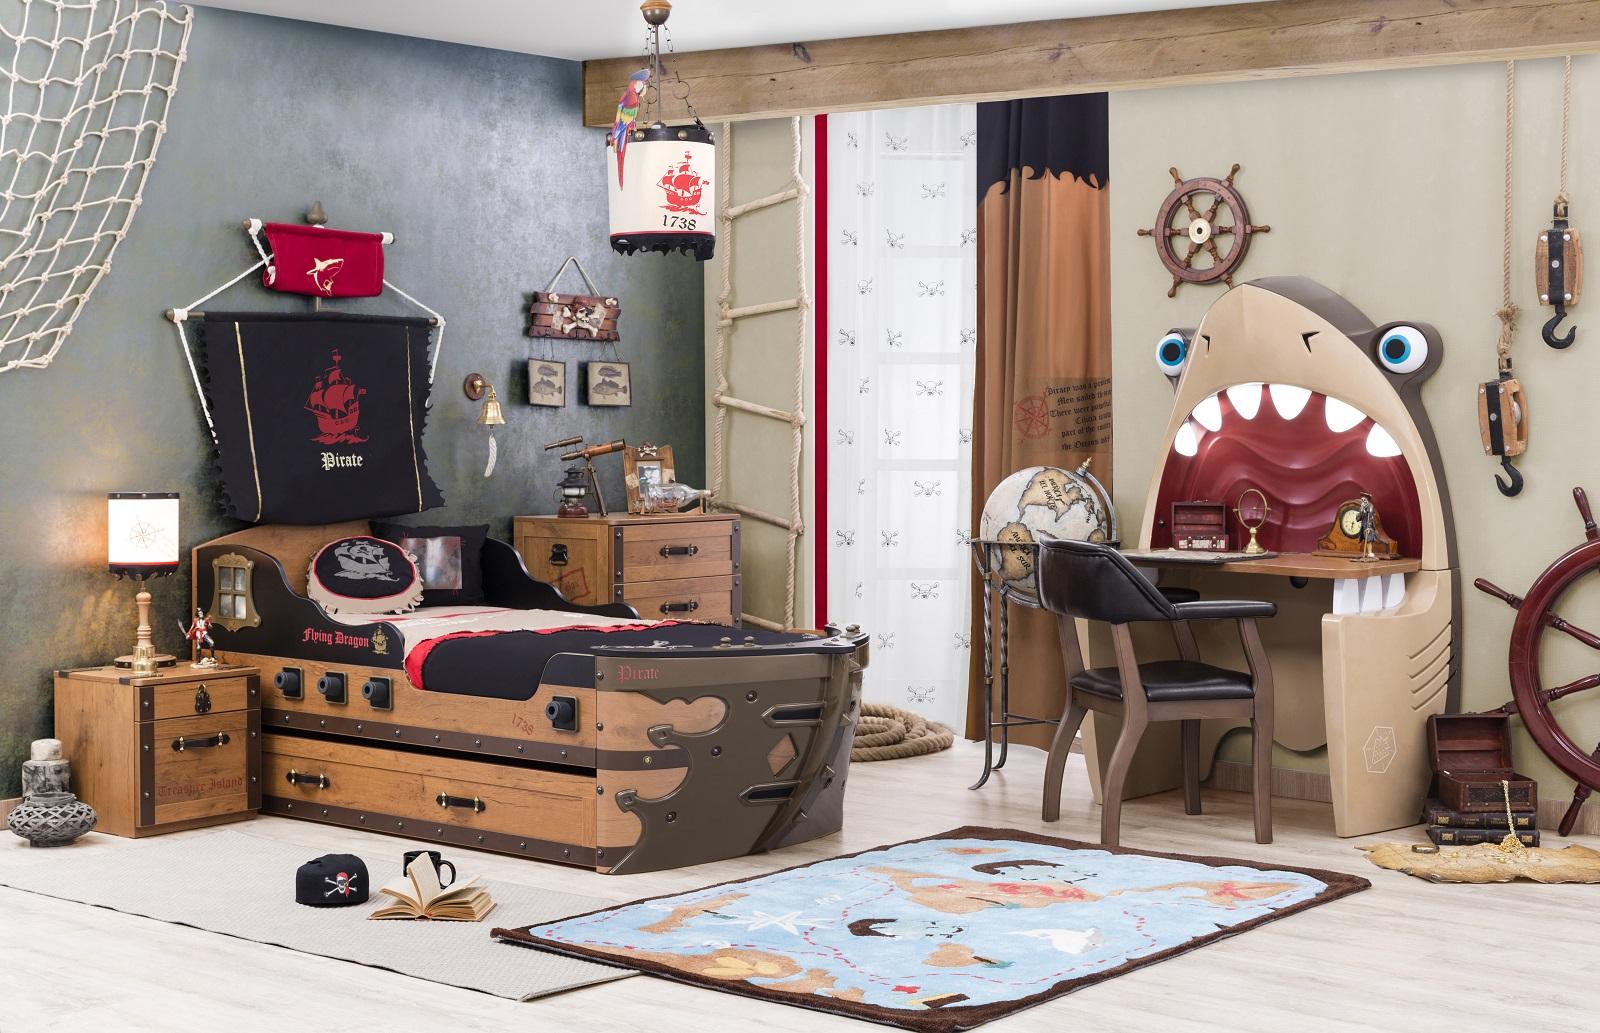 Full Size of Regal Kinderzimmer Weiß Regale Sofa Kinderzimmer Piraten Kinderzimmer